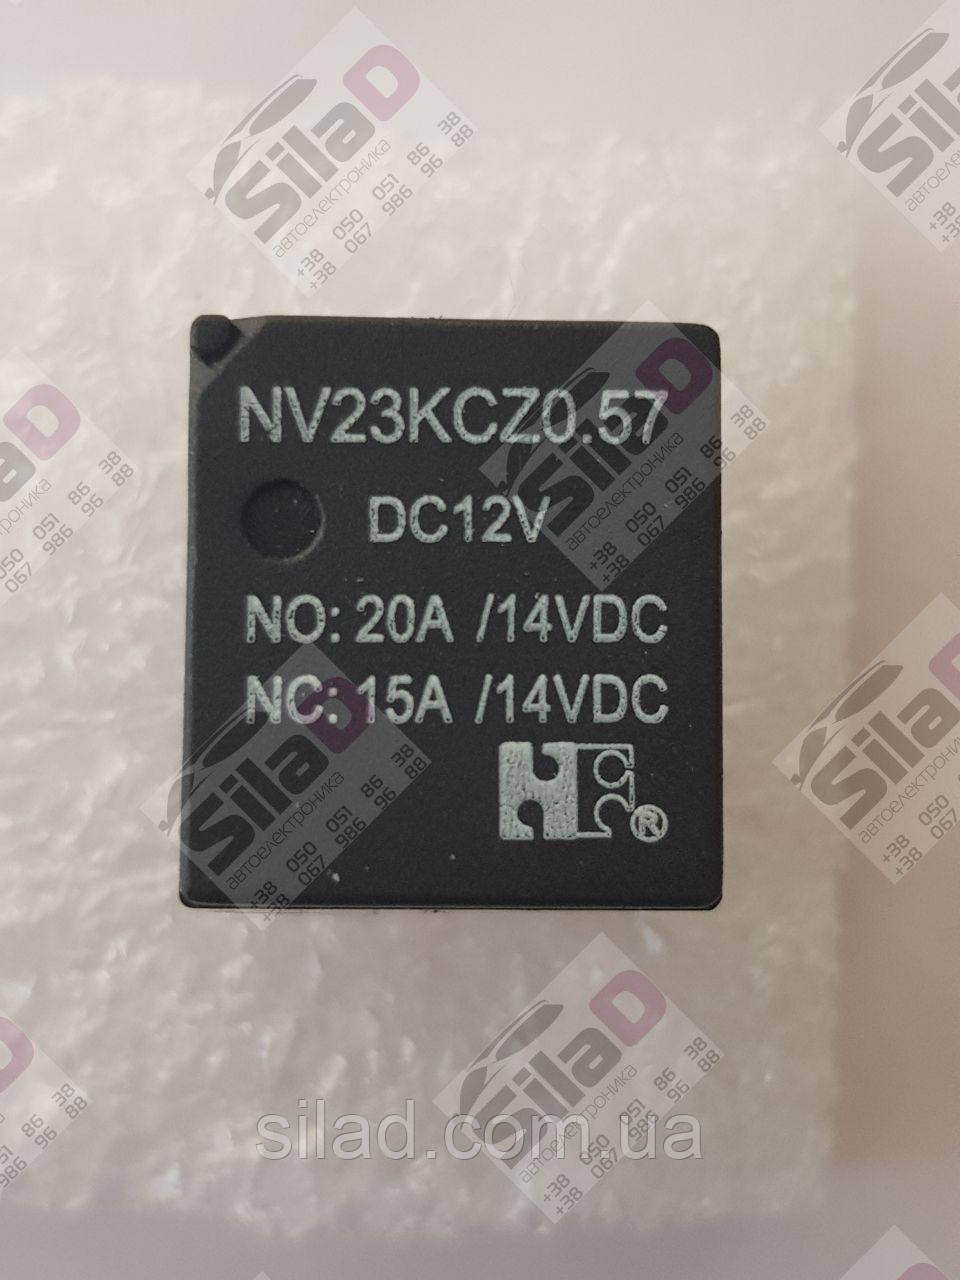 Реле NV23KC0.57 NV23KCZ0.57 DC12V 20A Forward корпус 5 Pin